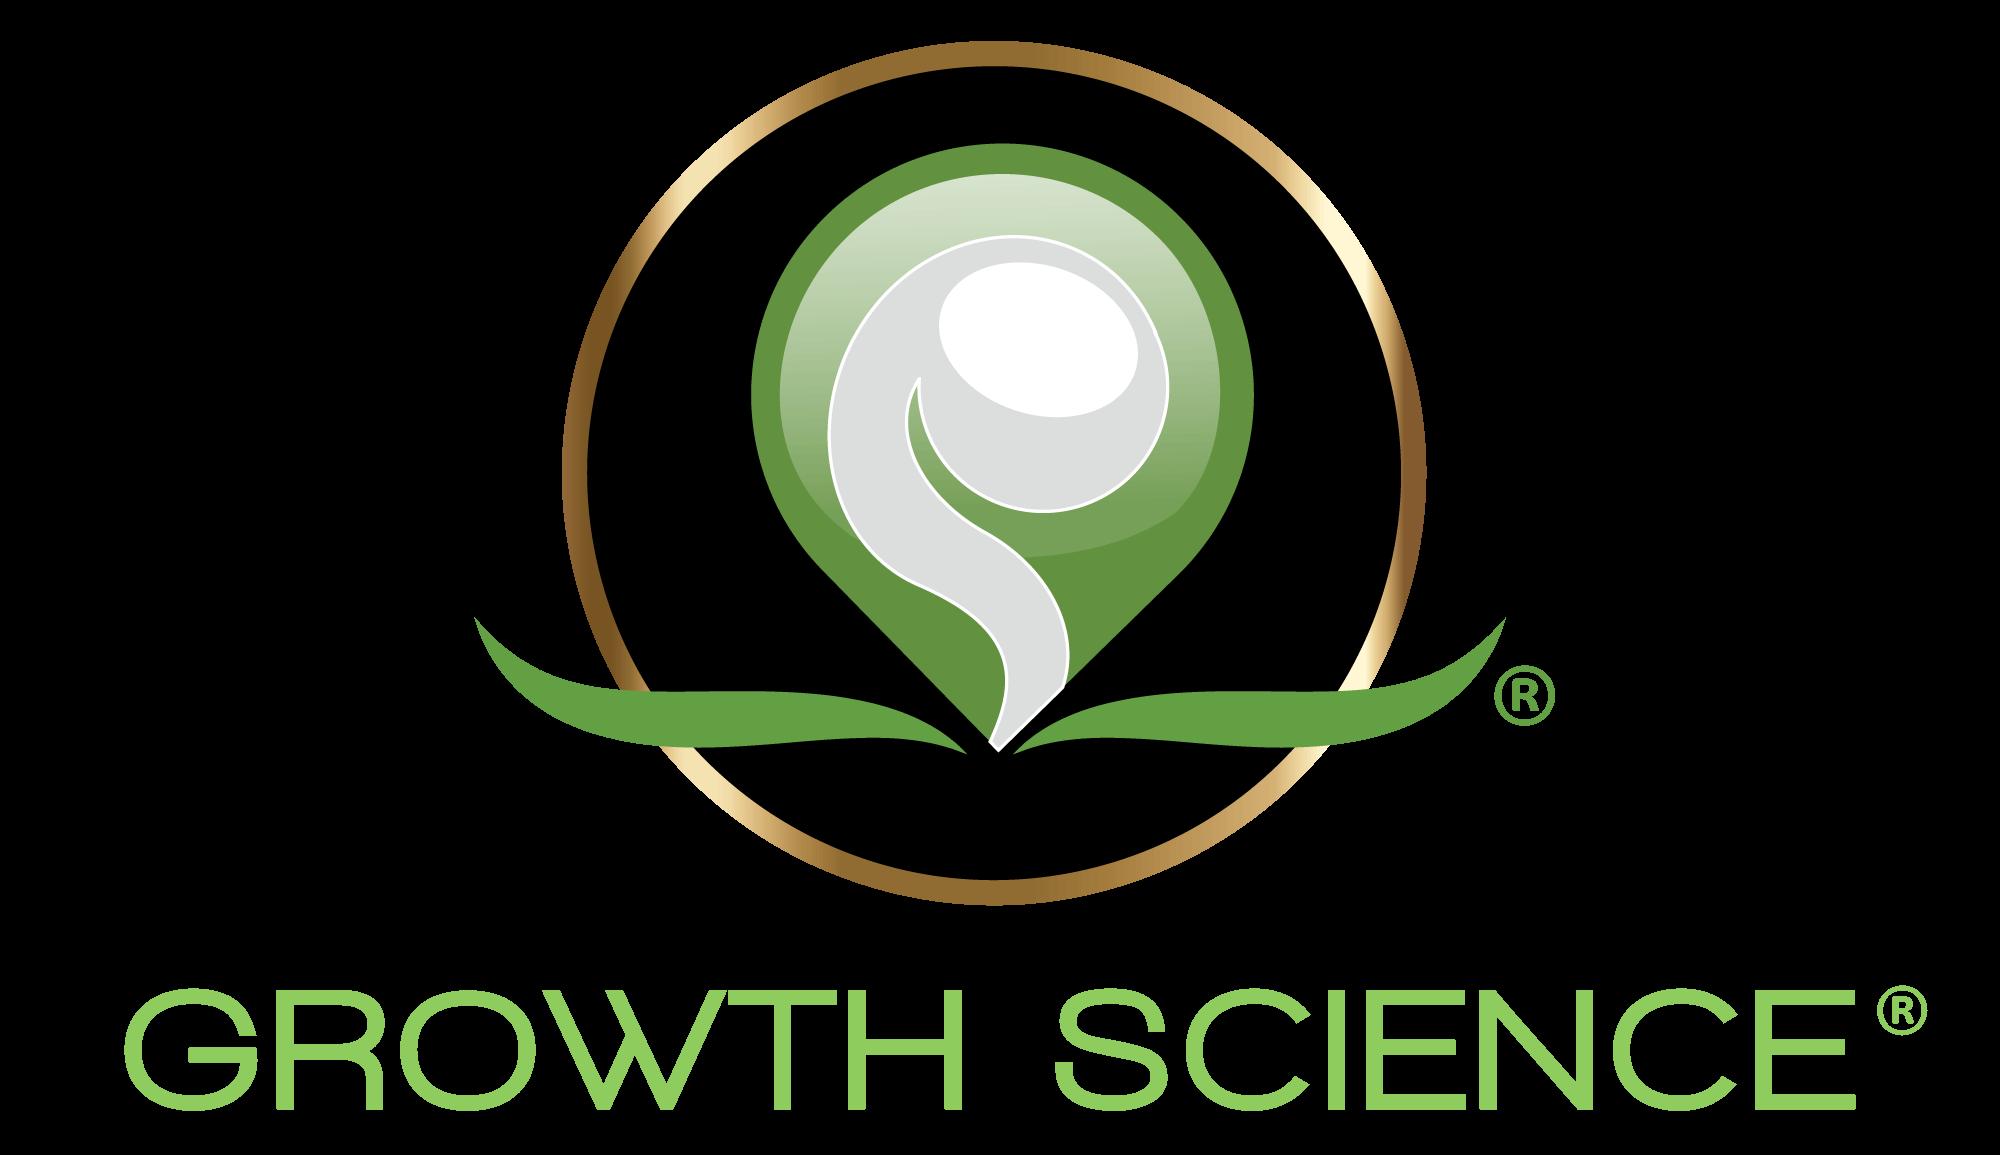 https://0901.nccdn.net/4_2/000/000/05c/c64/grow-science-logo.png